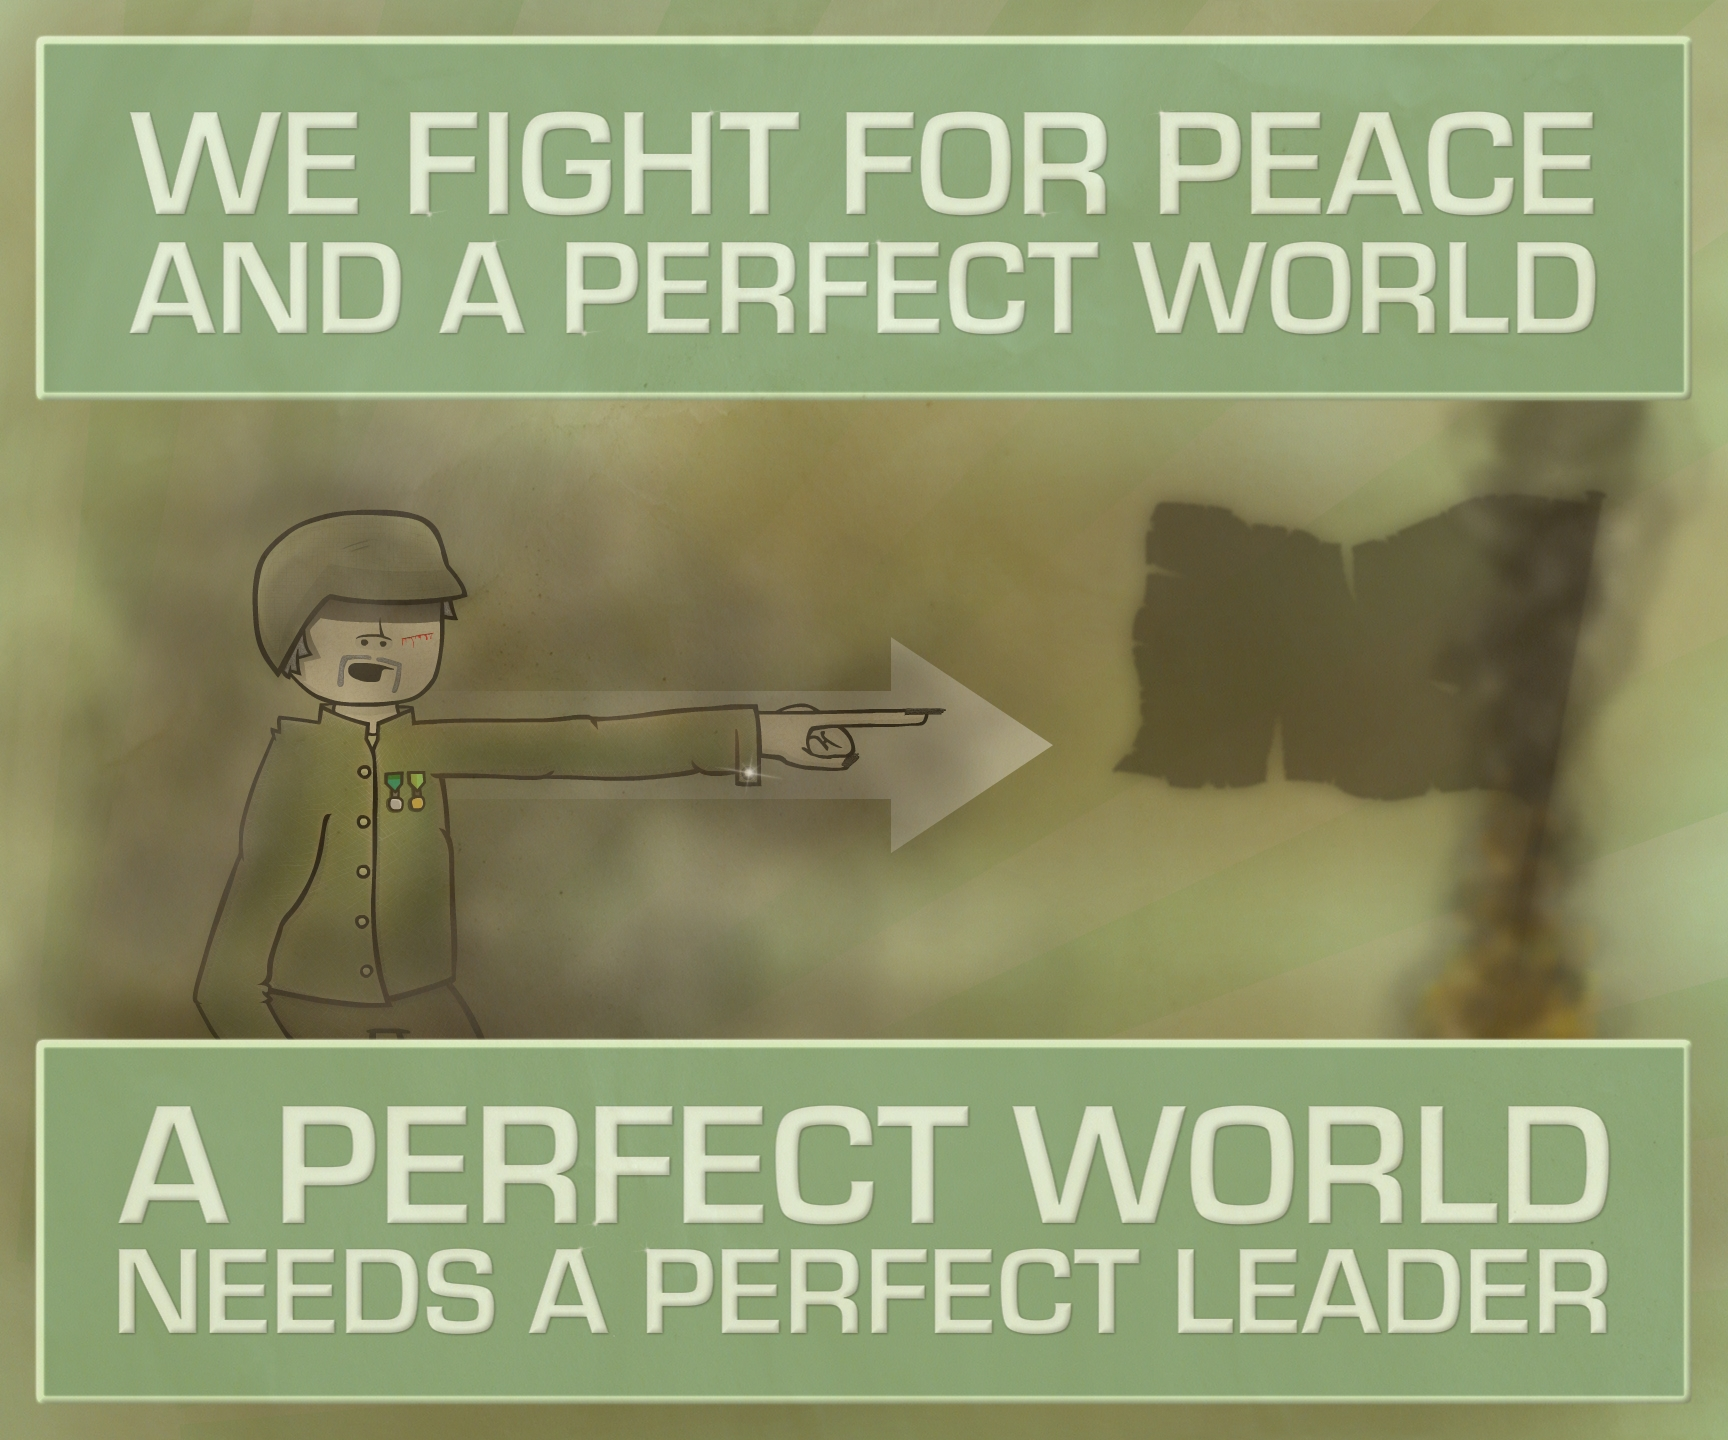 Propaganda for Perfection